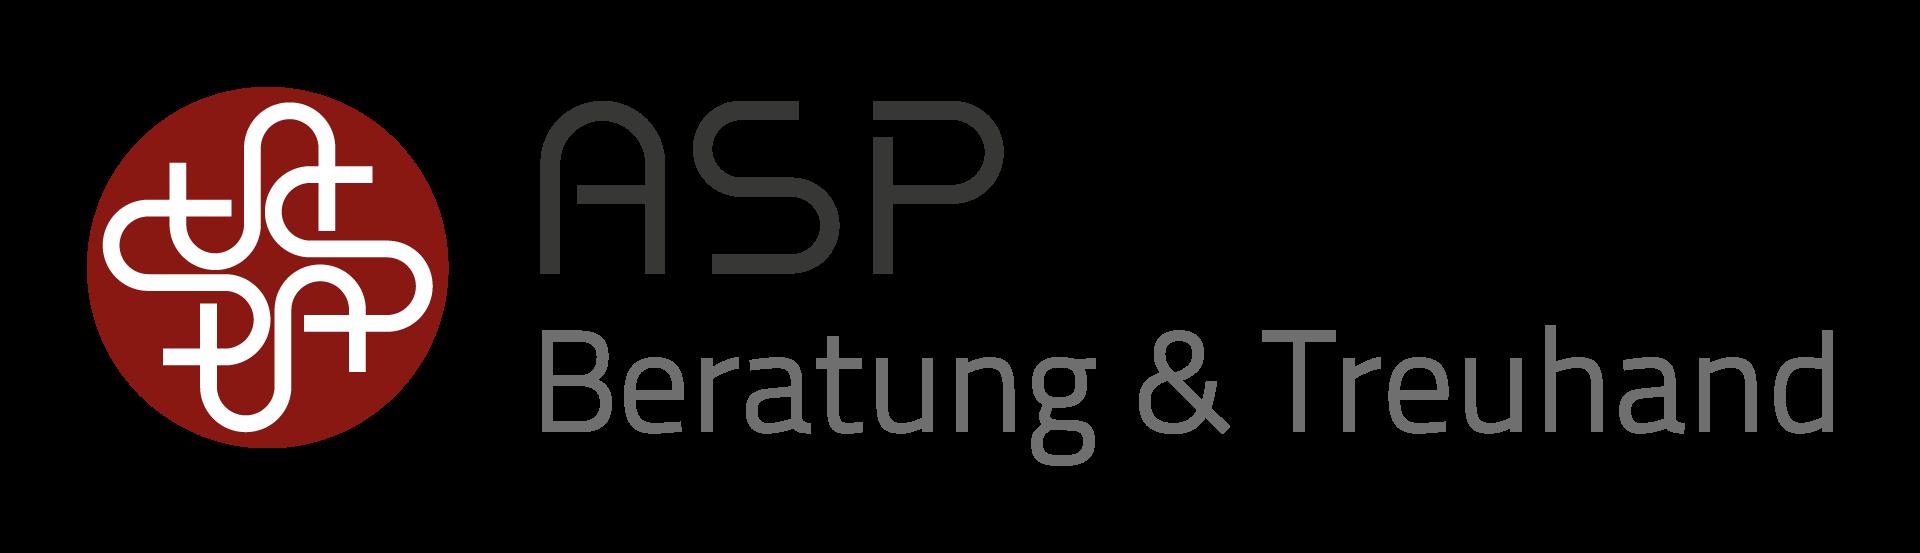 ASP Beratung & Treuhand AG